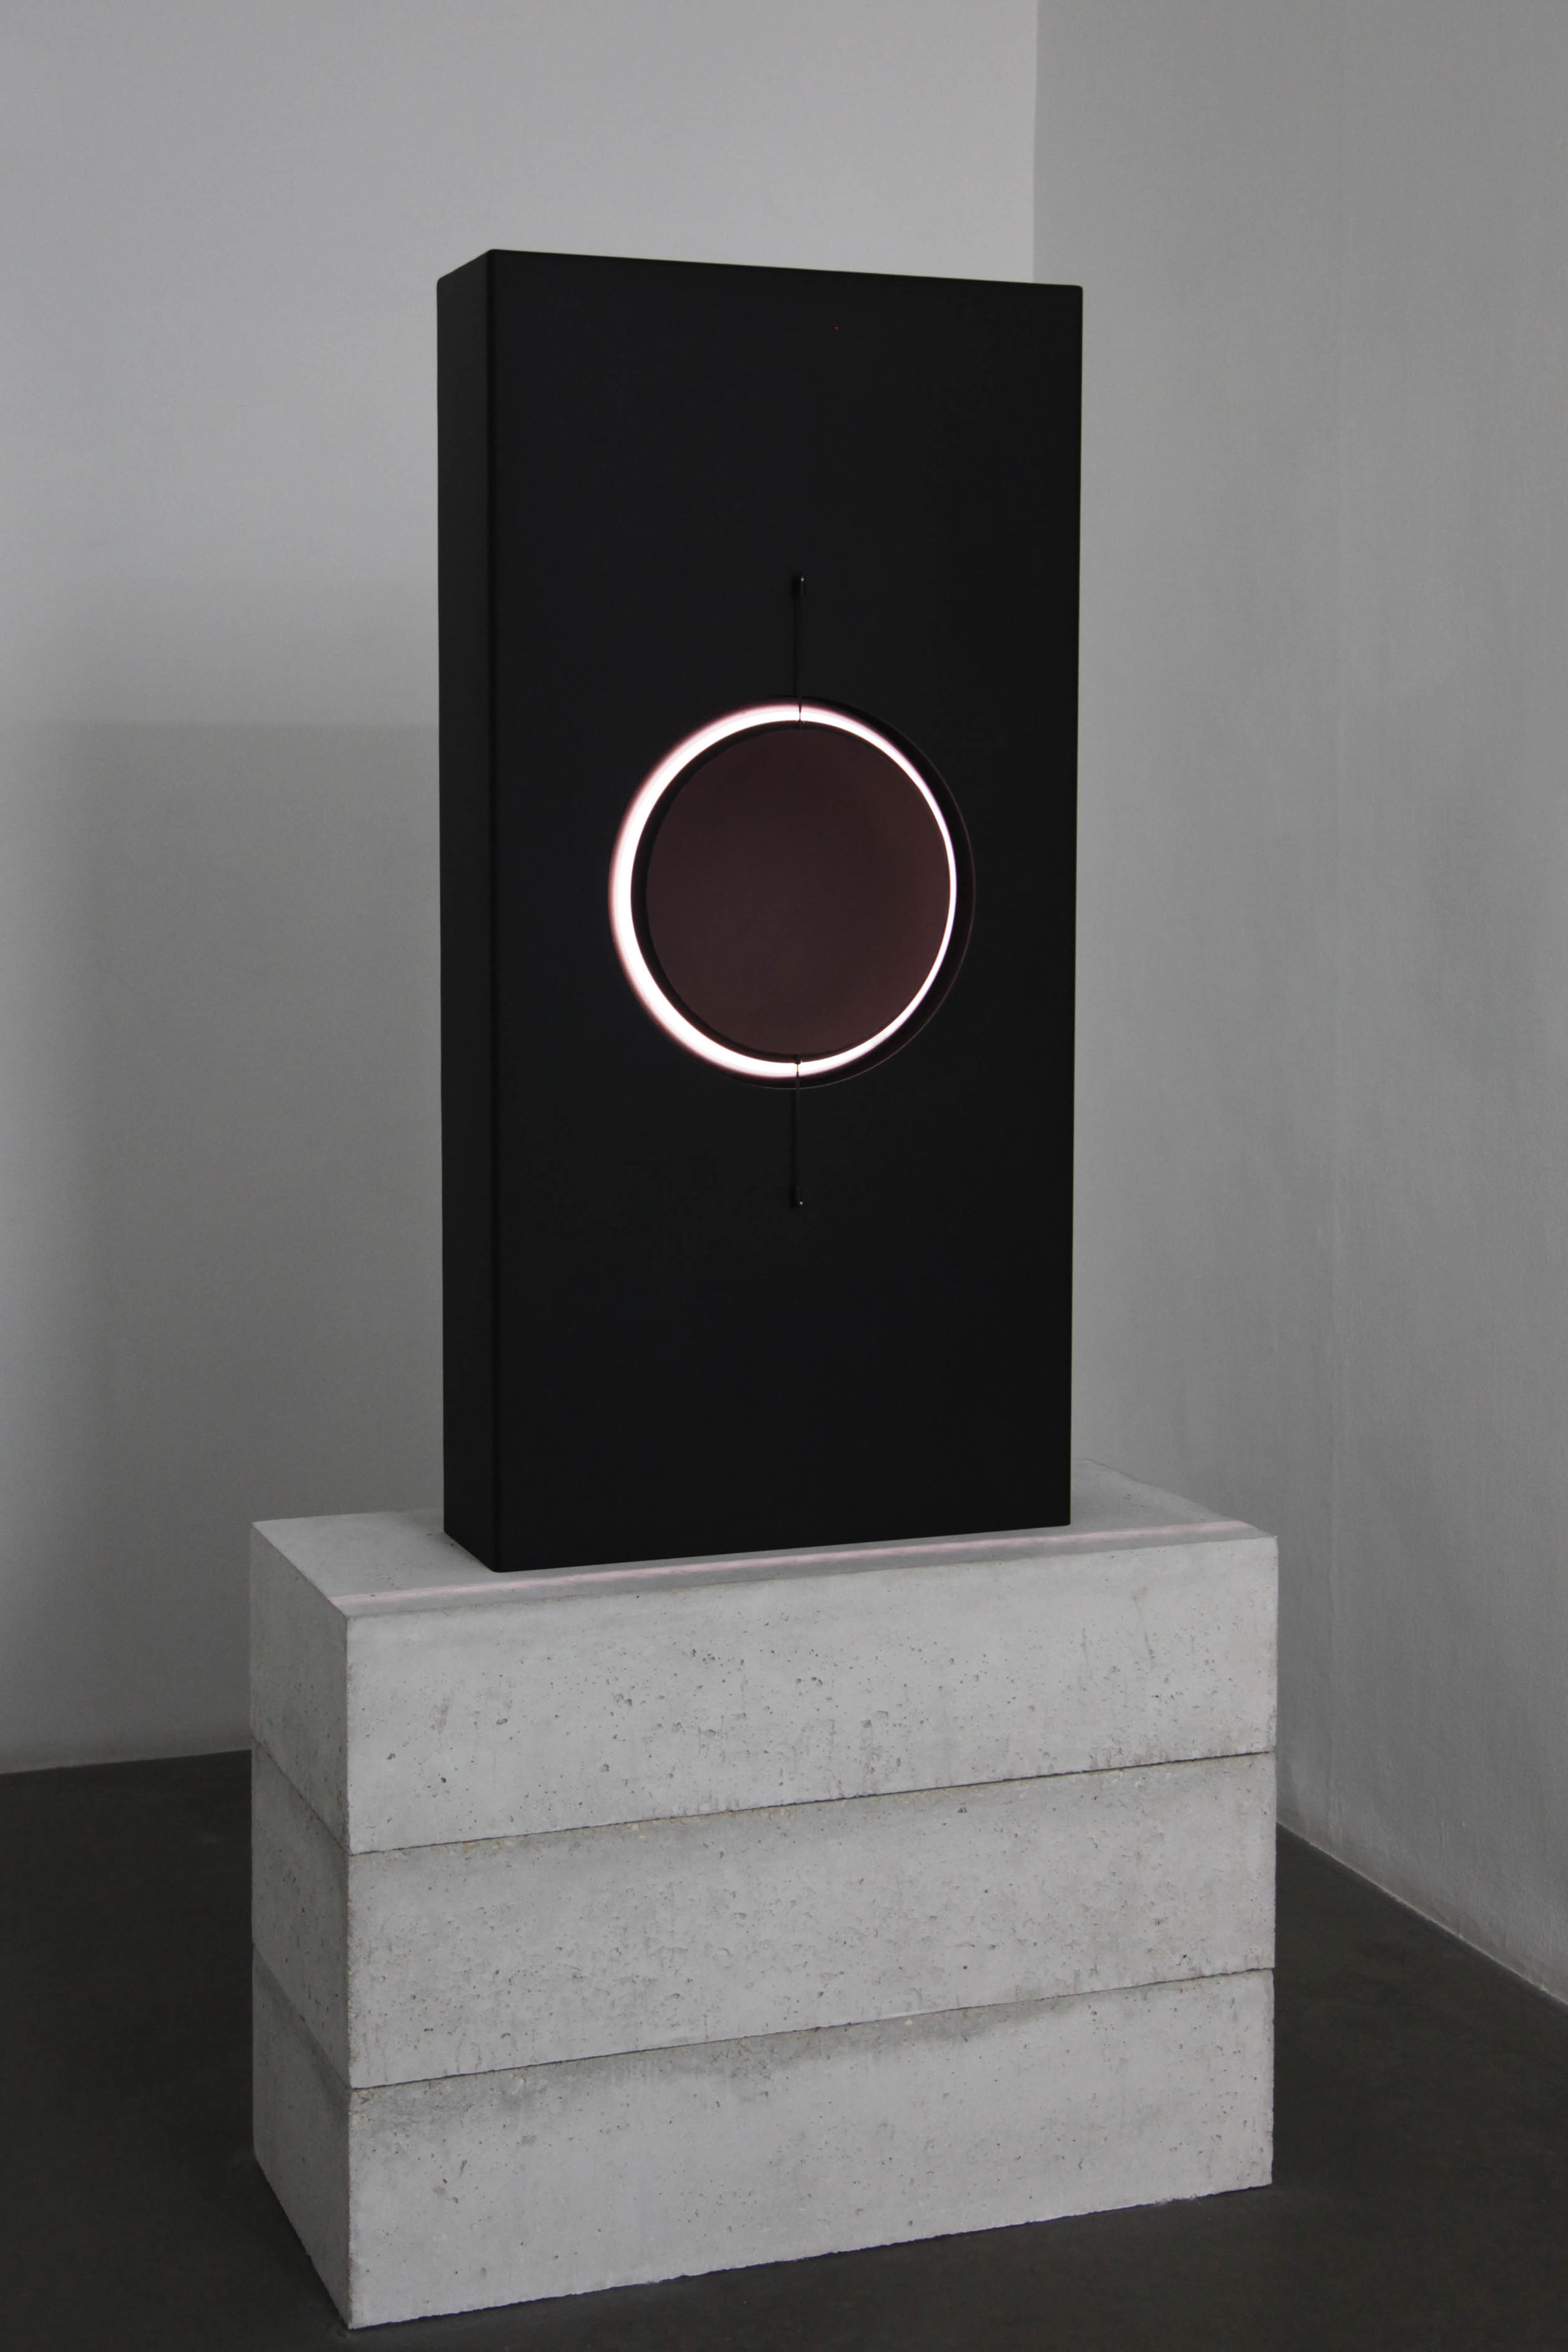 SPHEROLITHE   Floor sculpture Anodized, bead-blasted aluminum, LED light source 135 x 64 x 20 cm ed. 2/3